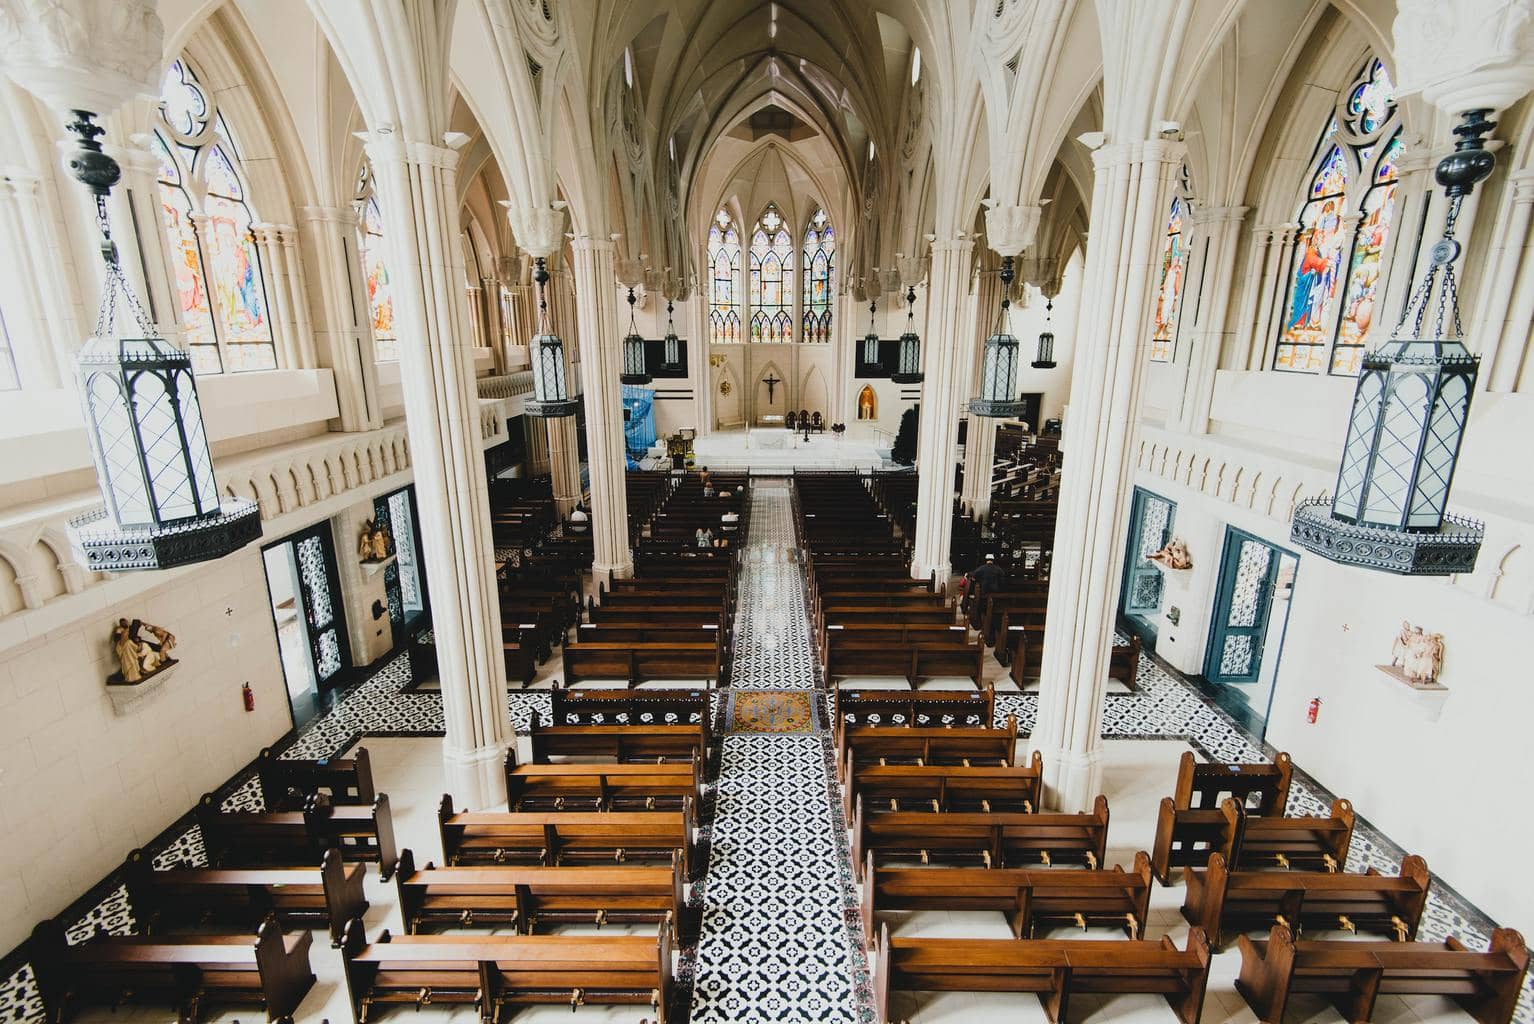 Interior de iglesia fotografiado con objetivo de 16mm